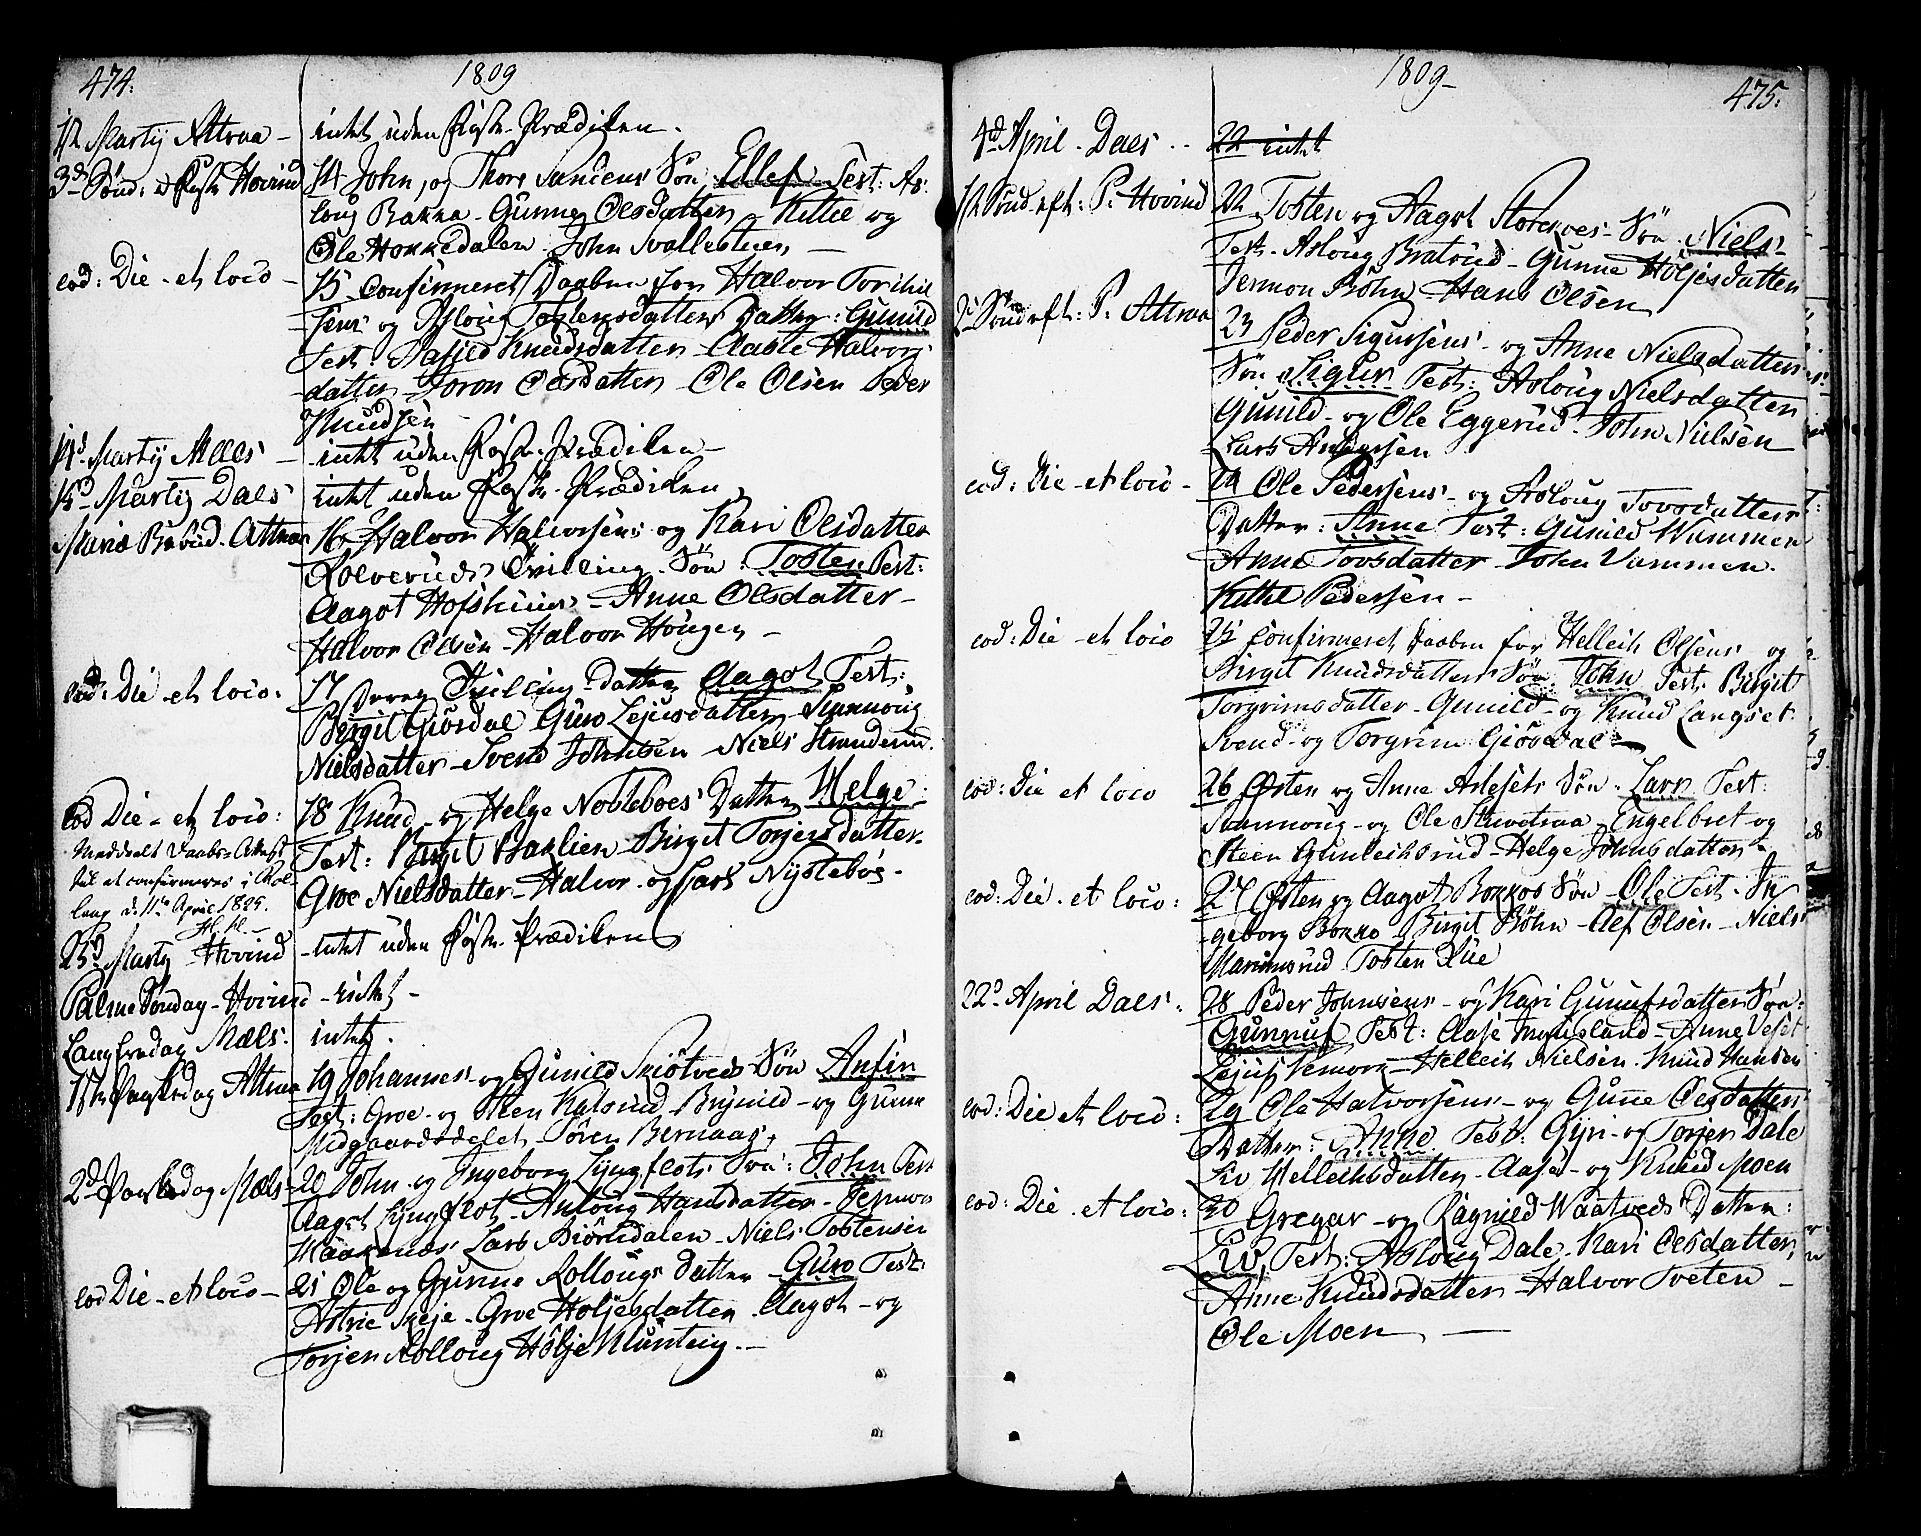 SAKO, Tinn kirkebøker, F/Fa/L0002: Ministerialbok nr. I 2, 1757-1810, s. 474-475